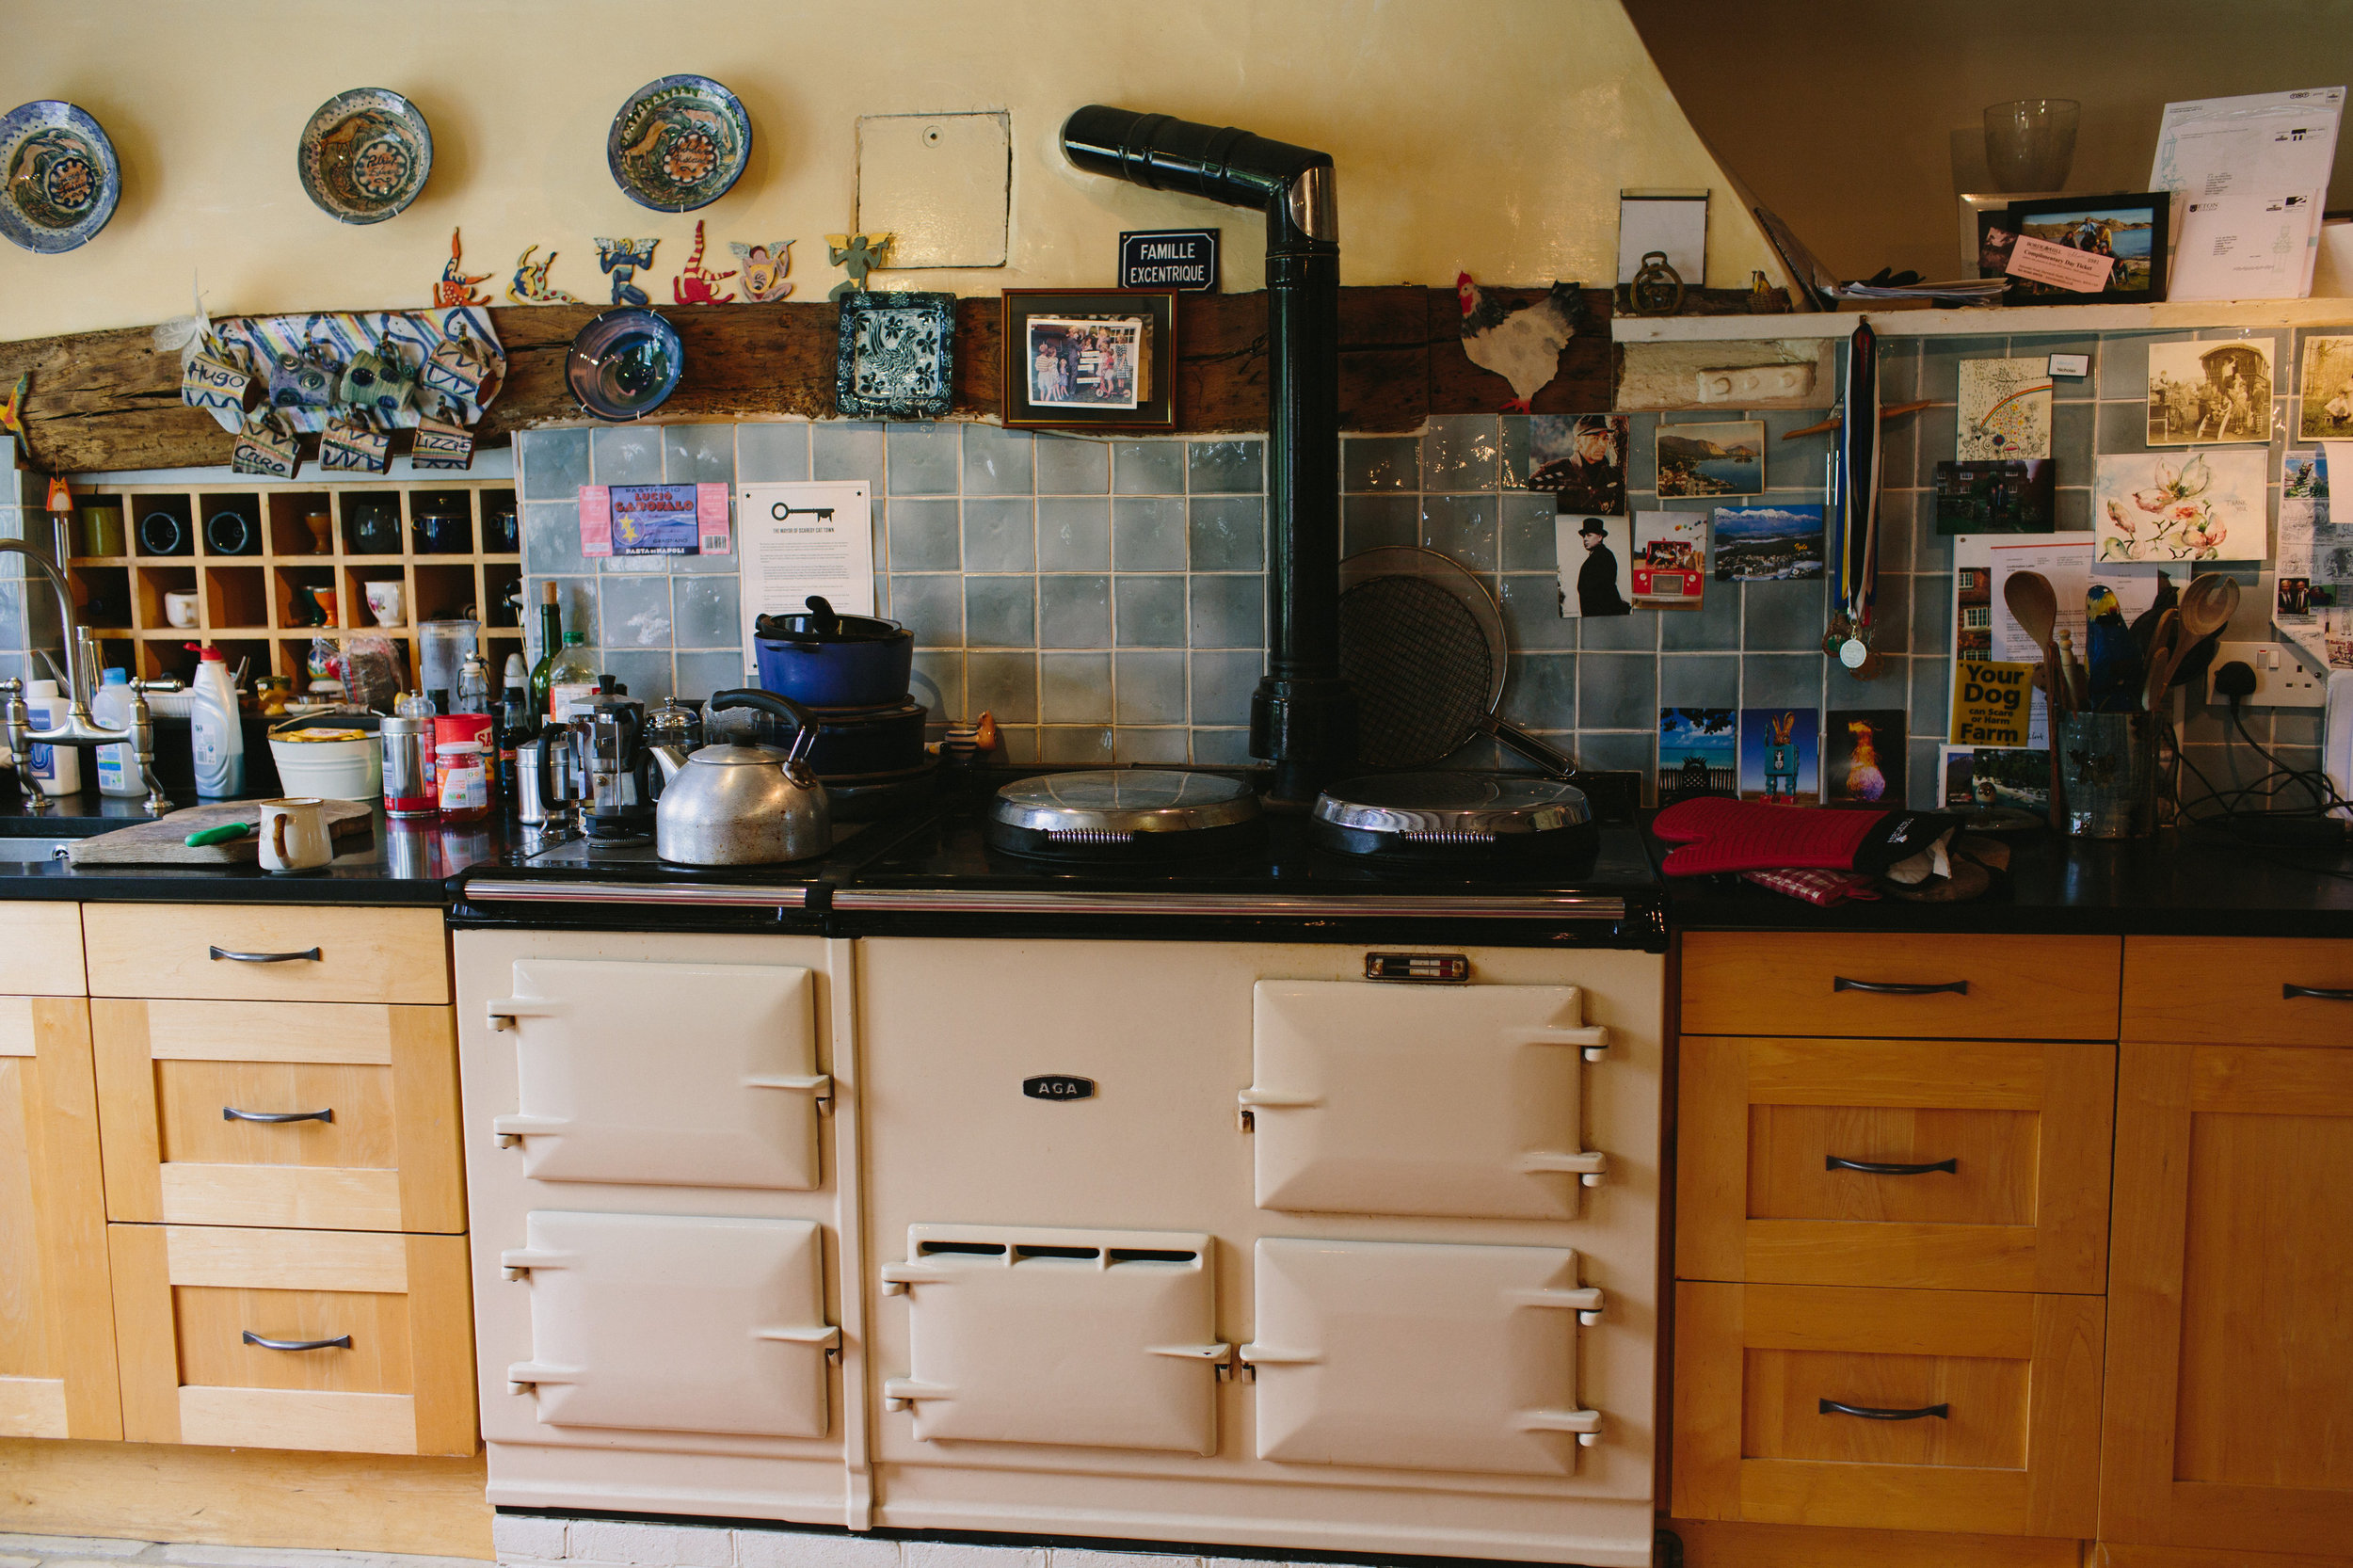 kitchen-aga.jpg